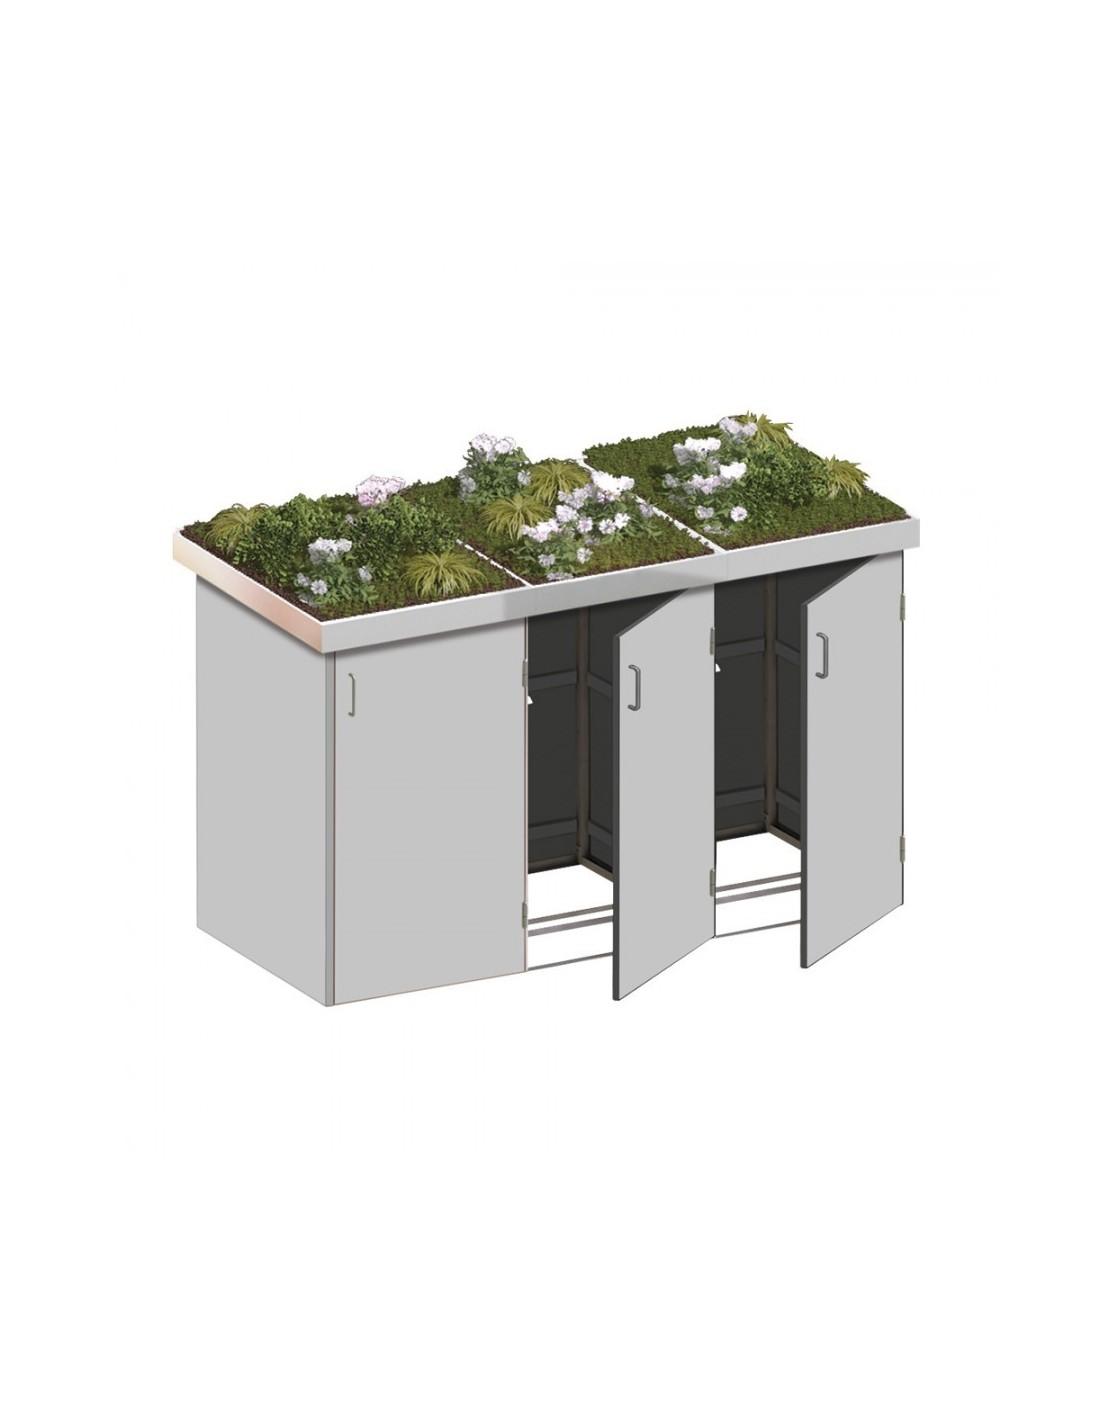 hpl scherm design 120x180 cm van wetter shop. Black Bedroom Furniture Sets. Home Design Ideas